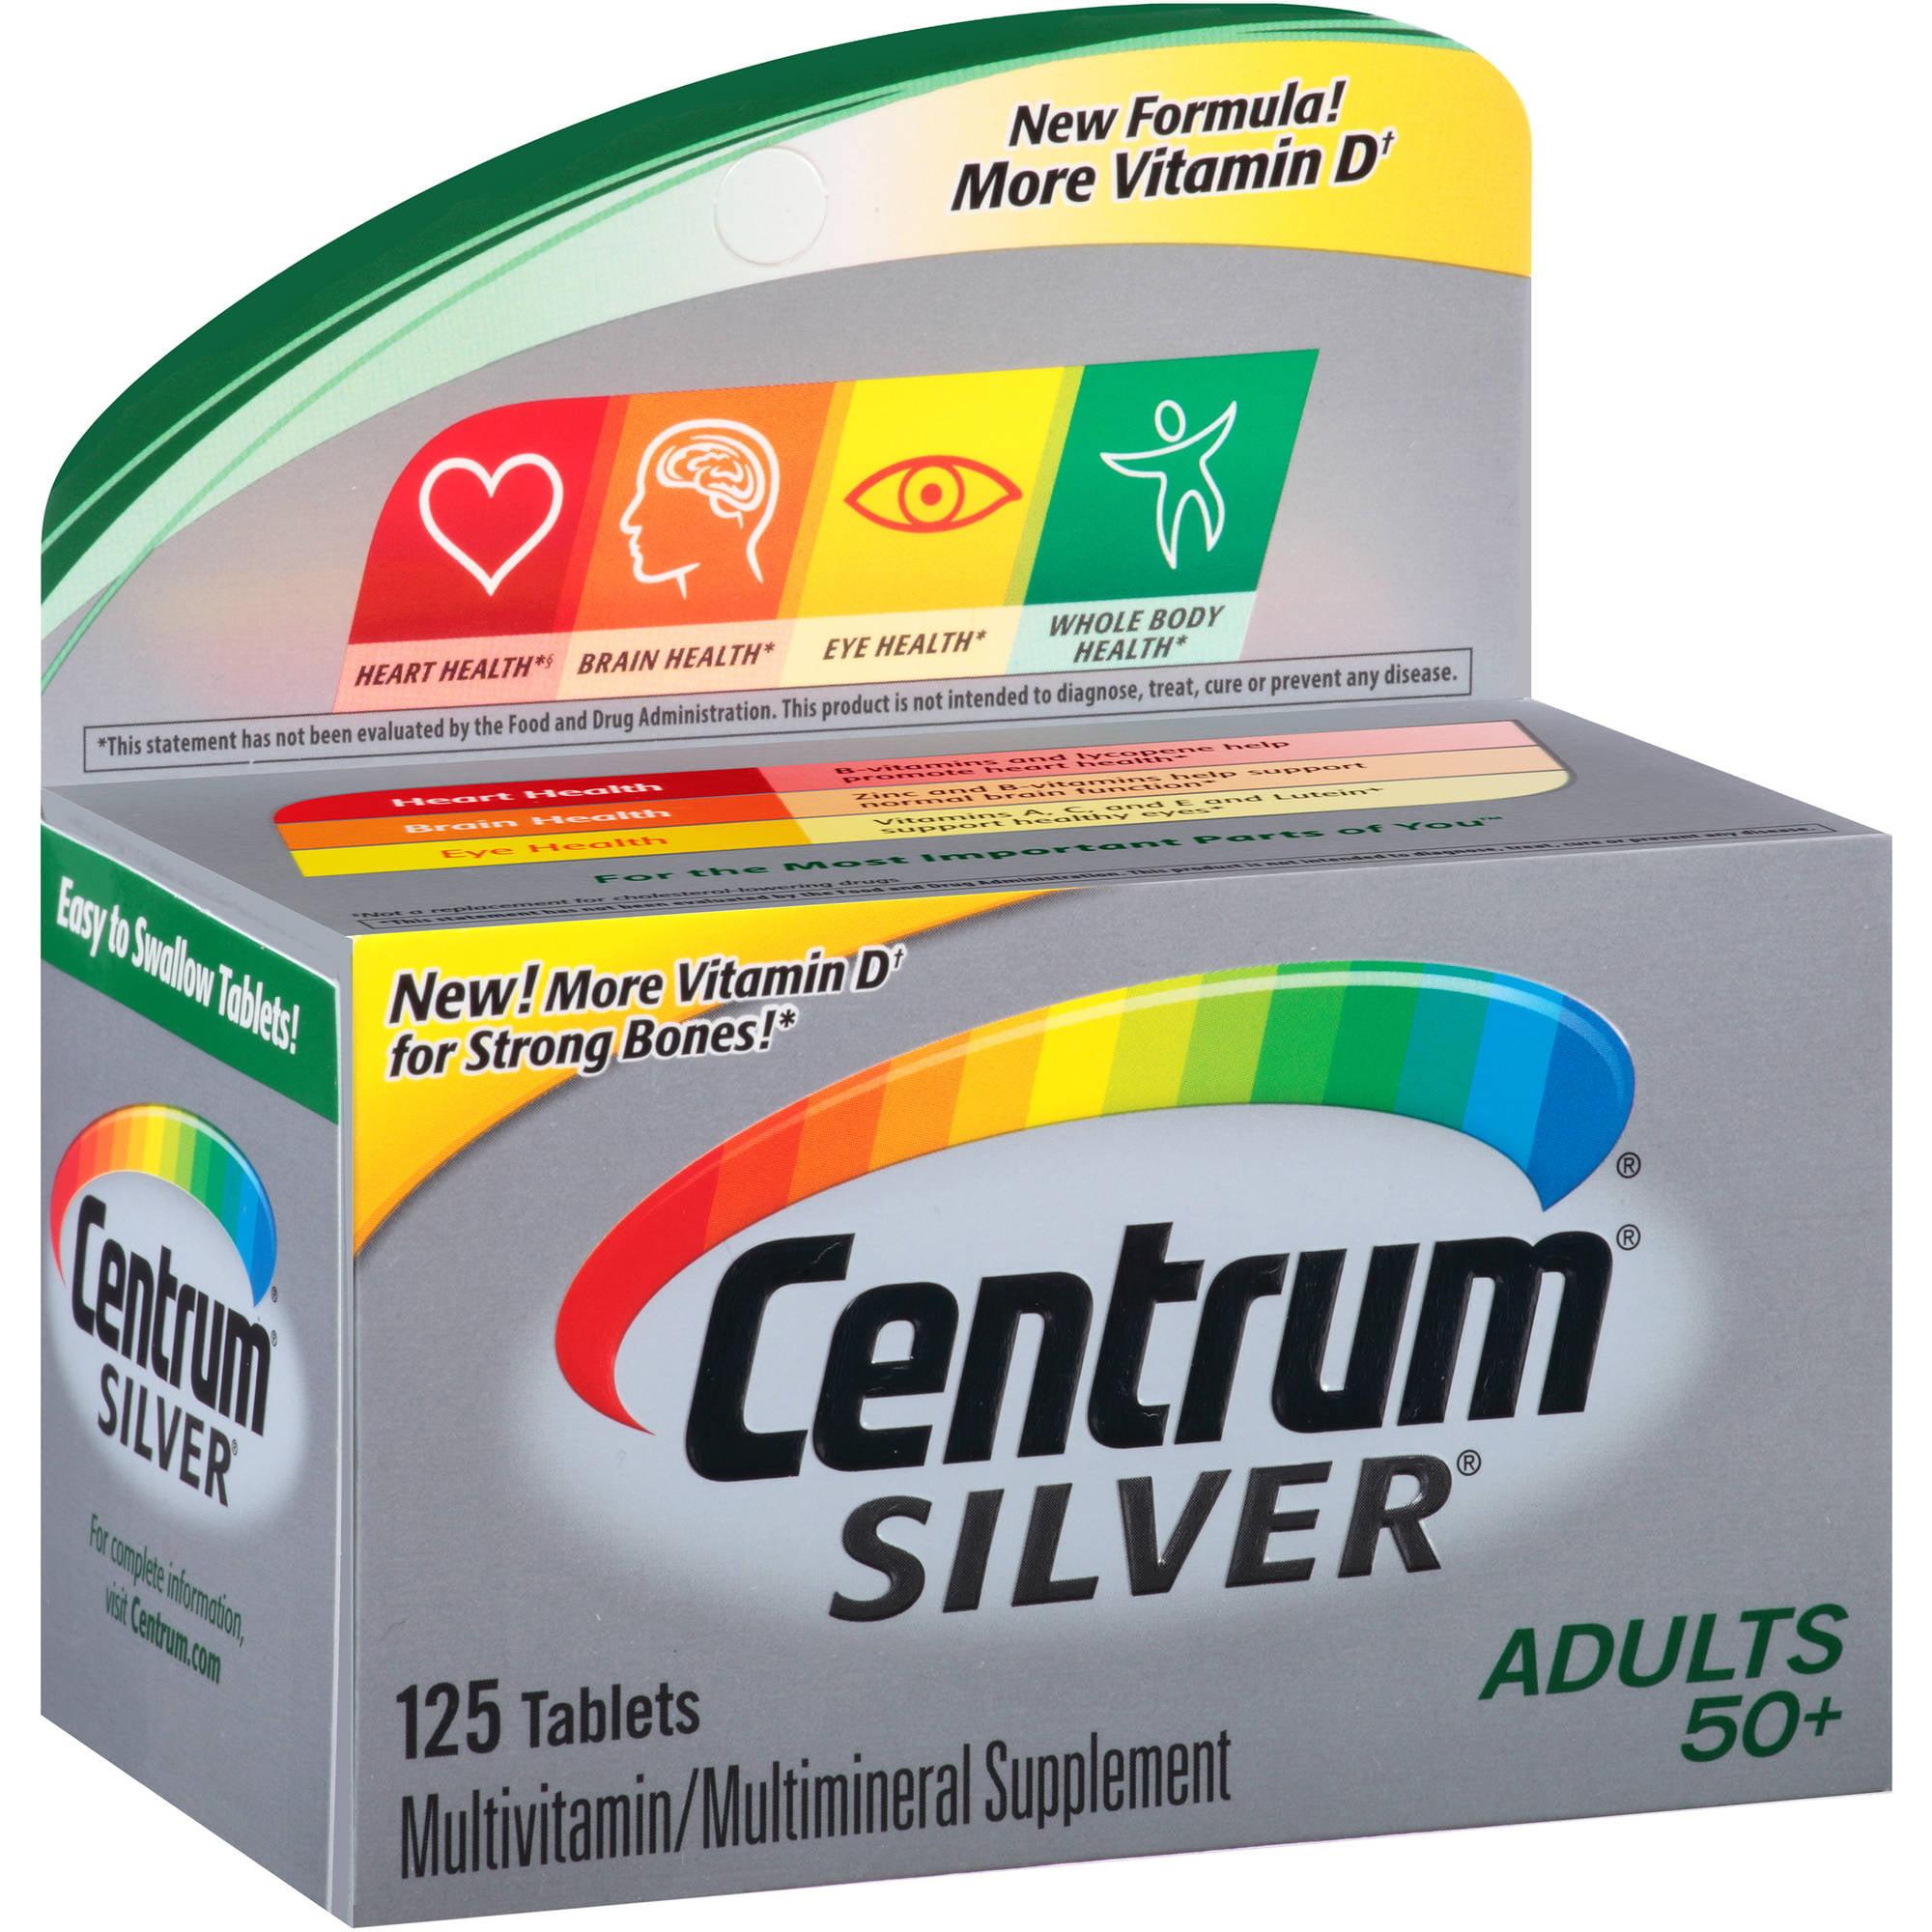 Centrum Silver Adult Multivitamin/Multimineral Supplement 125 Count